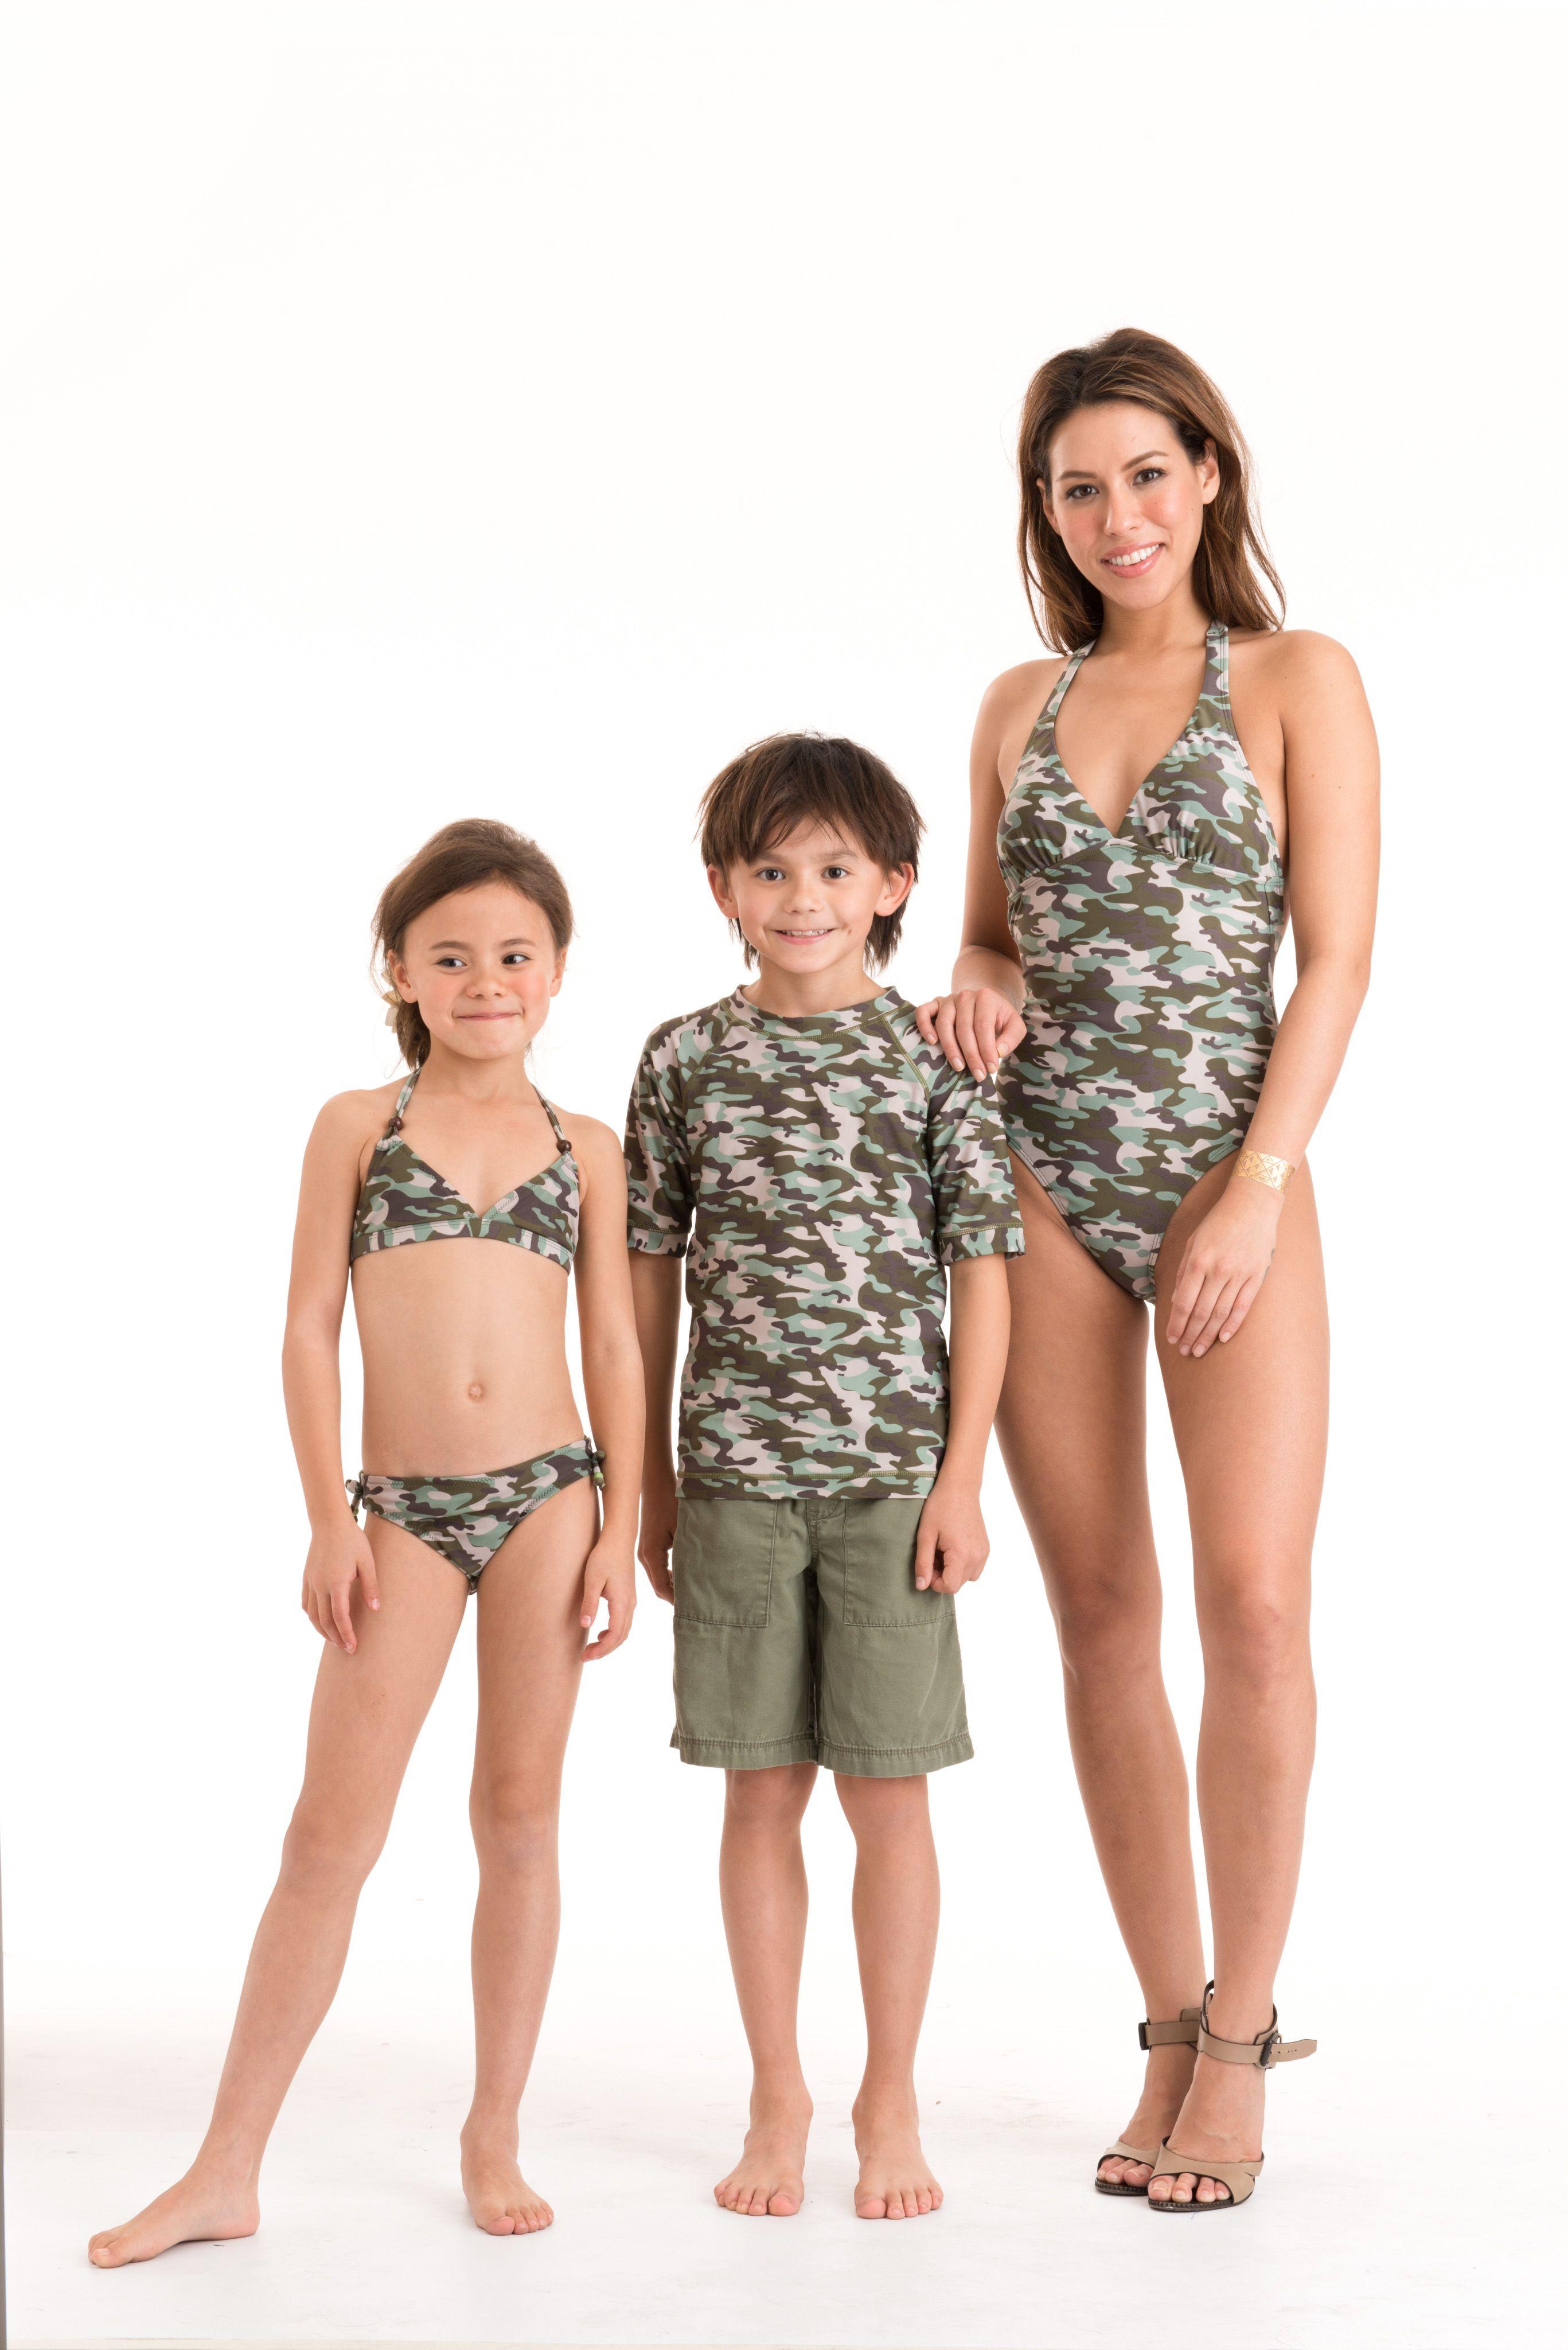 40c67b42bd Girls & boys camo camouflage swimsuits & bikini and sun shirts absolutely  gorgeous! Itsy Betsy bikini and Ruffle neck onepiece for kids 2-10yrs.  Matching ...